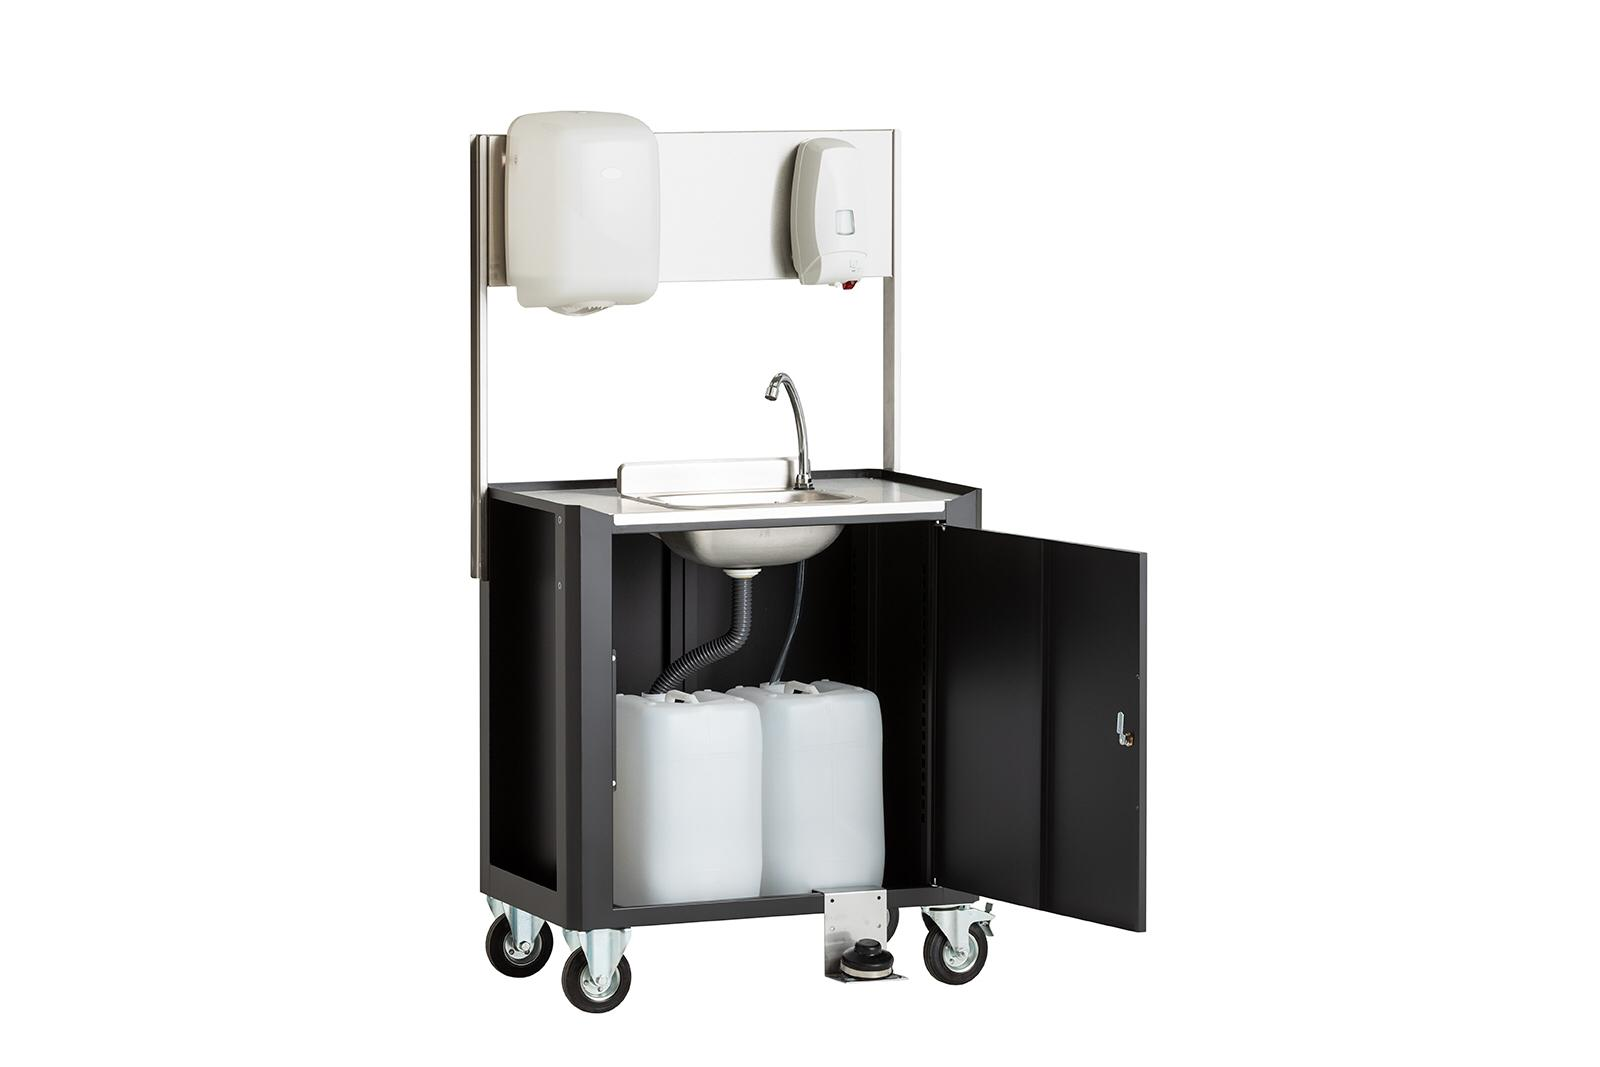 Mobile washing unit foto 2